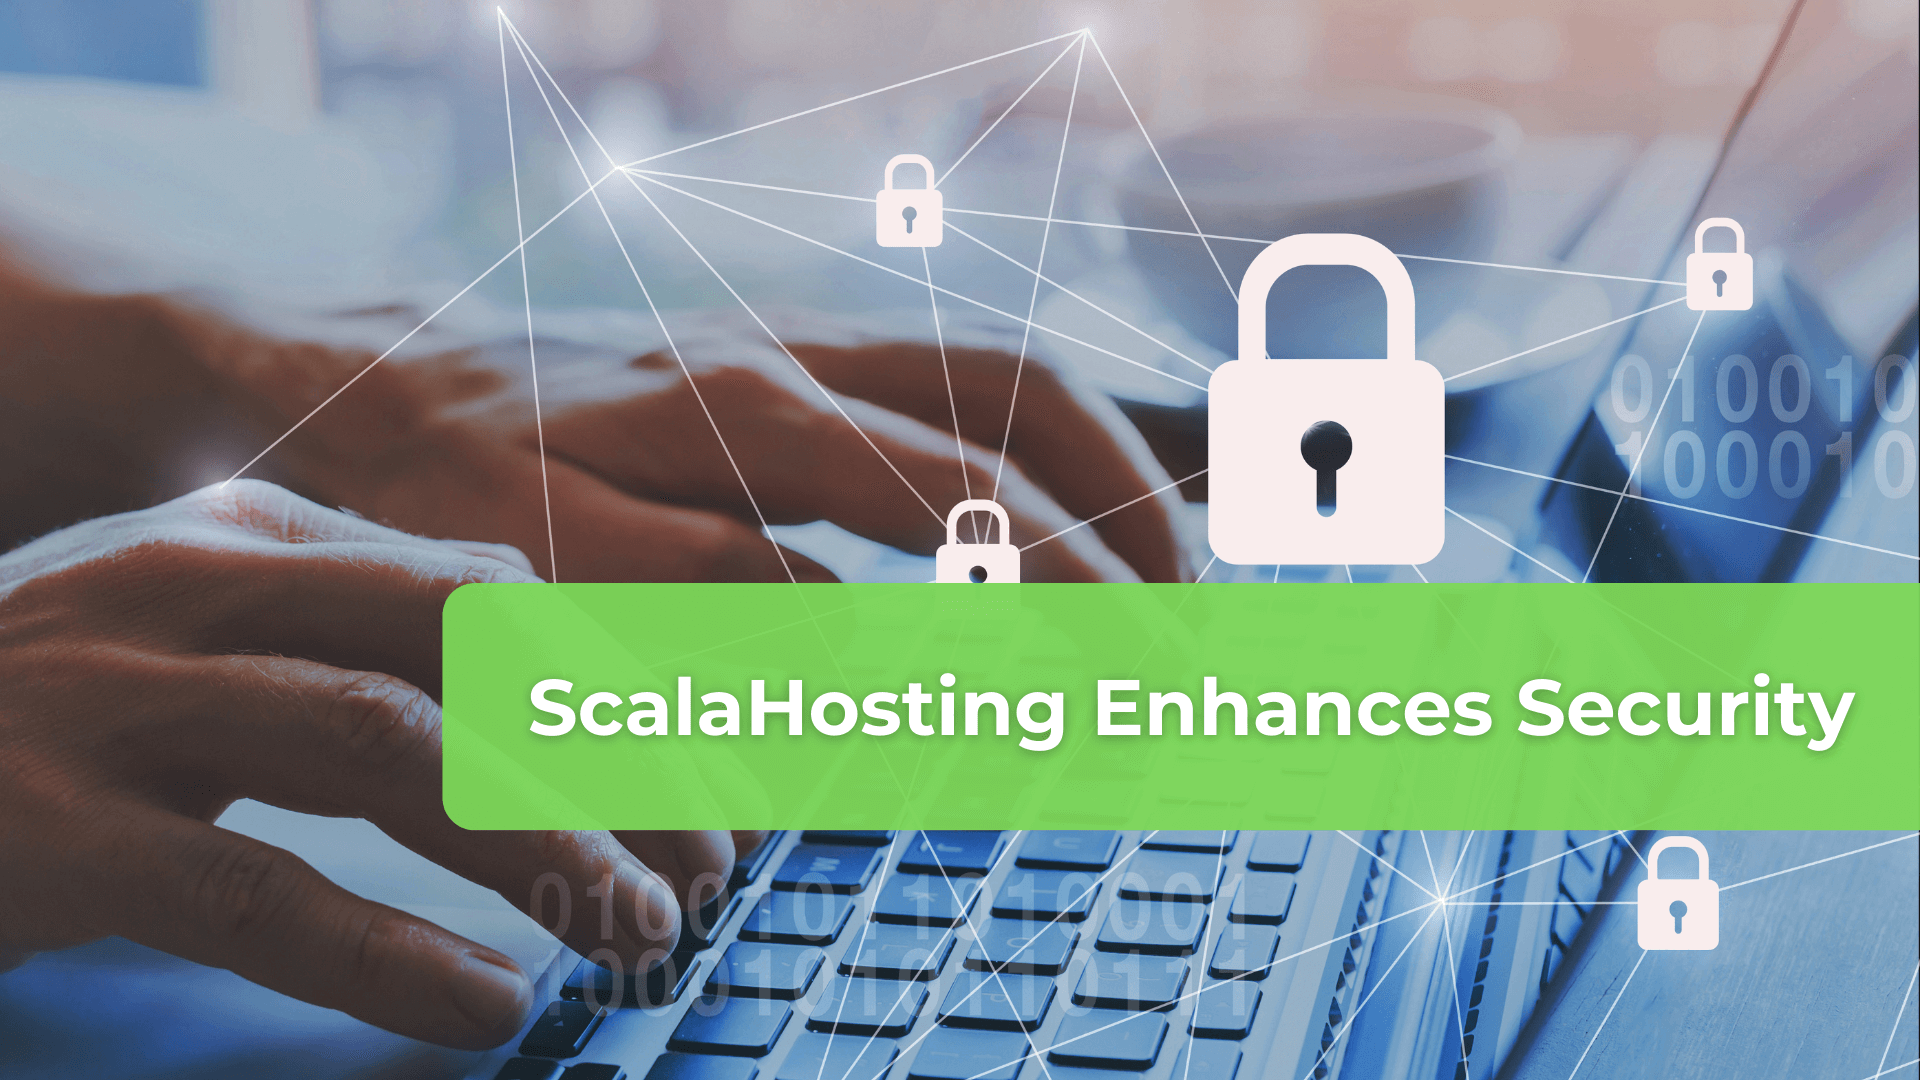 ScalaHosting Enhances Security